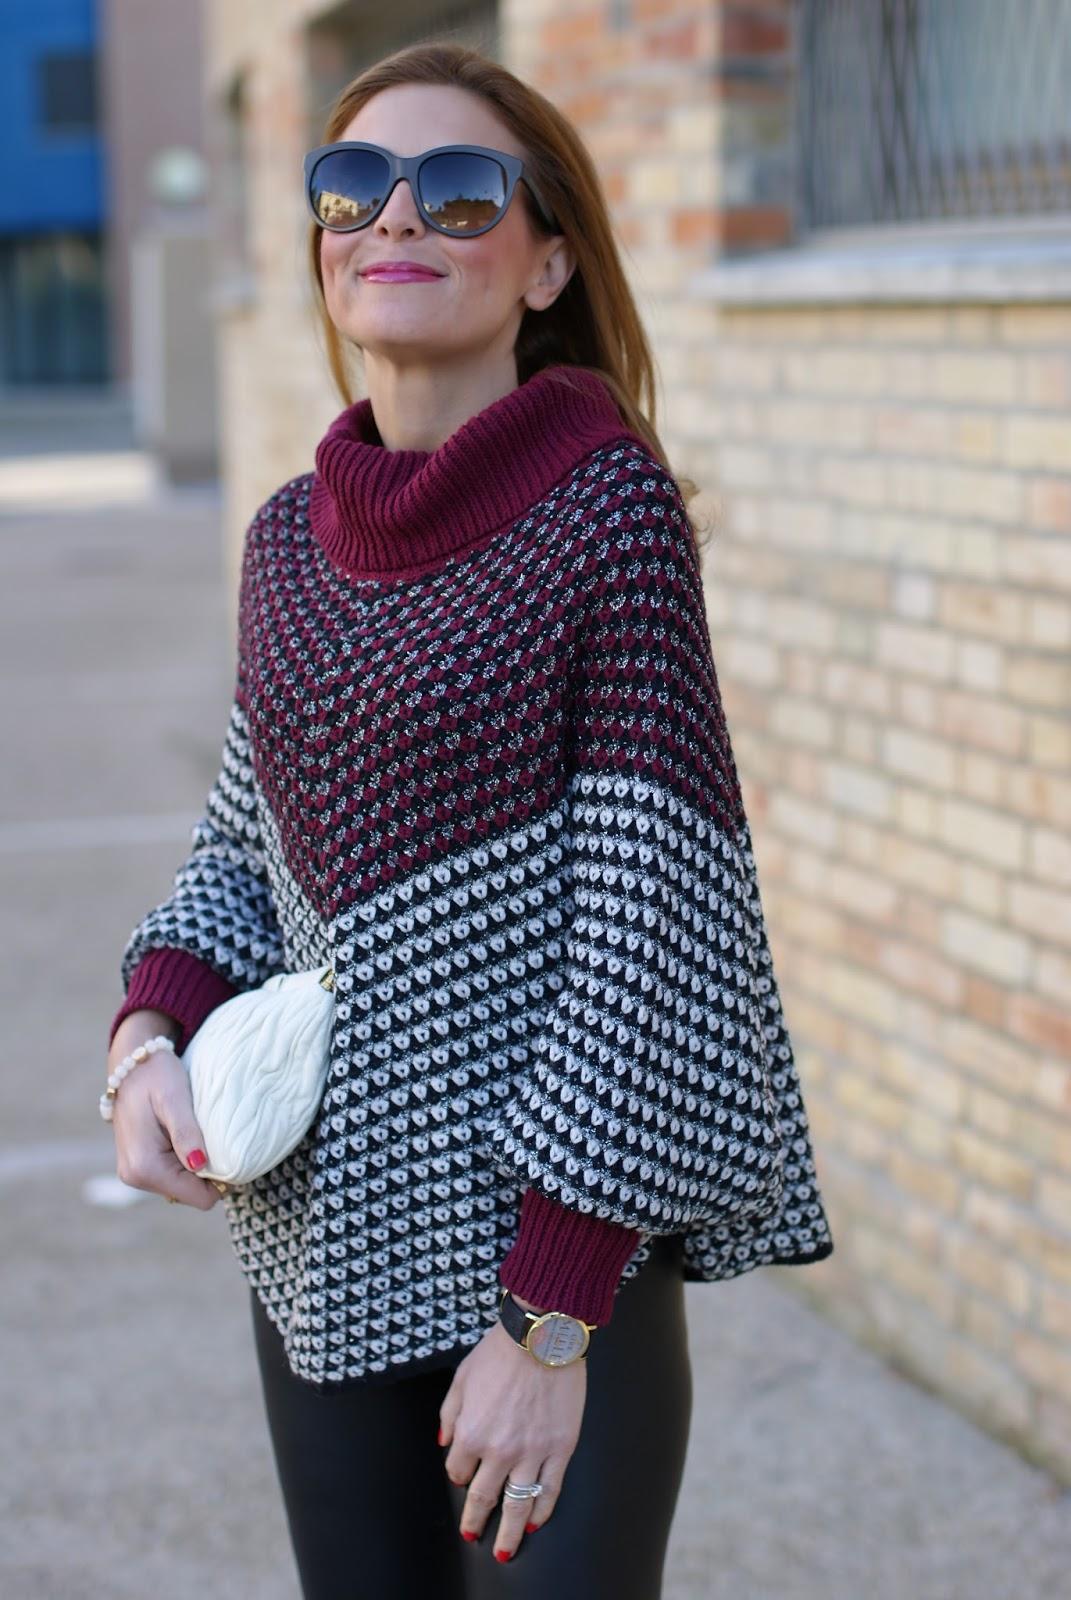 Millelire Giuseppe Verdi watch and Smash! Prolix sweater on Fashion and Cookies fashion blog, fashion blogger style